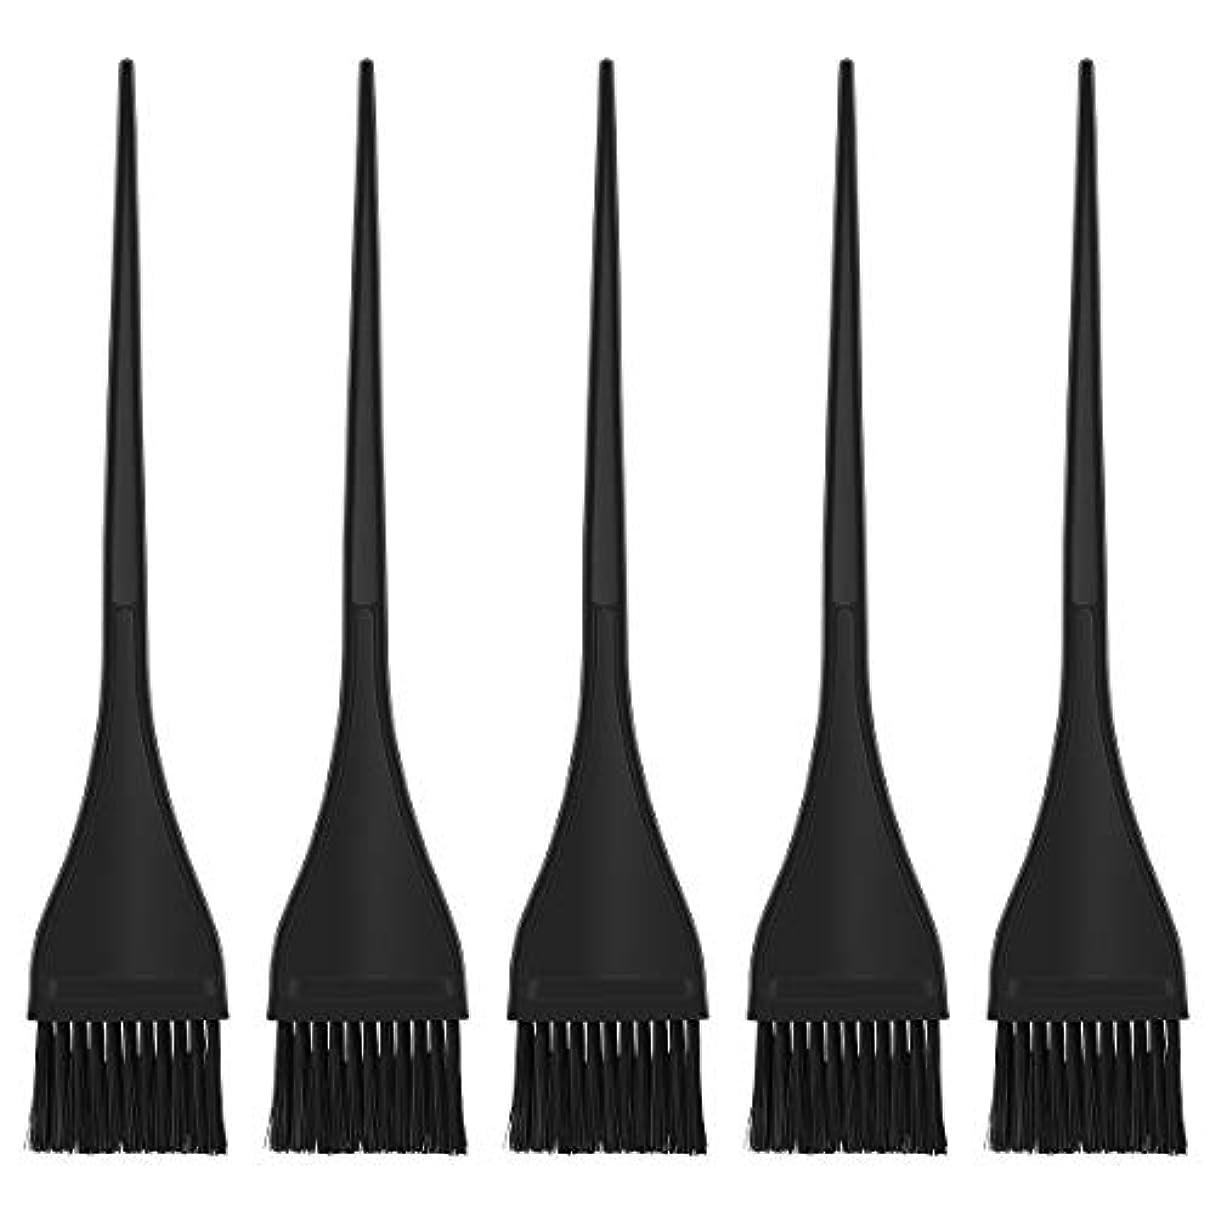 Lurrose ヘアダイブラシ ヘアカラー 毛染め ブラシ ヘアダイコーム カラーリングブラシ 家庭用 美容師プロ用 5本セット(ブラック)